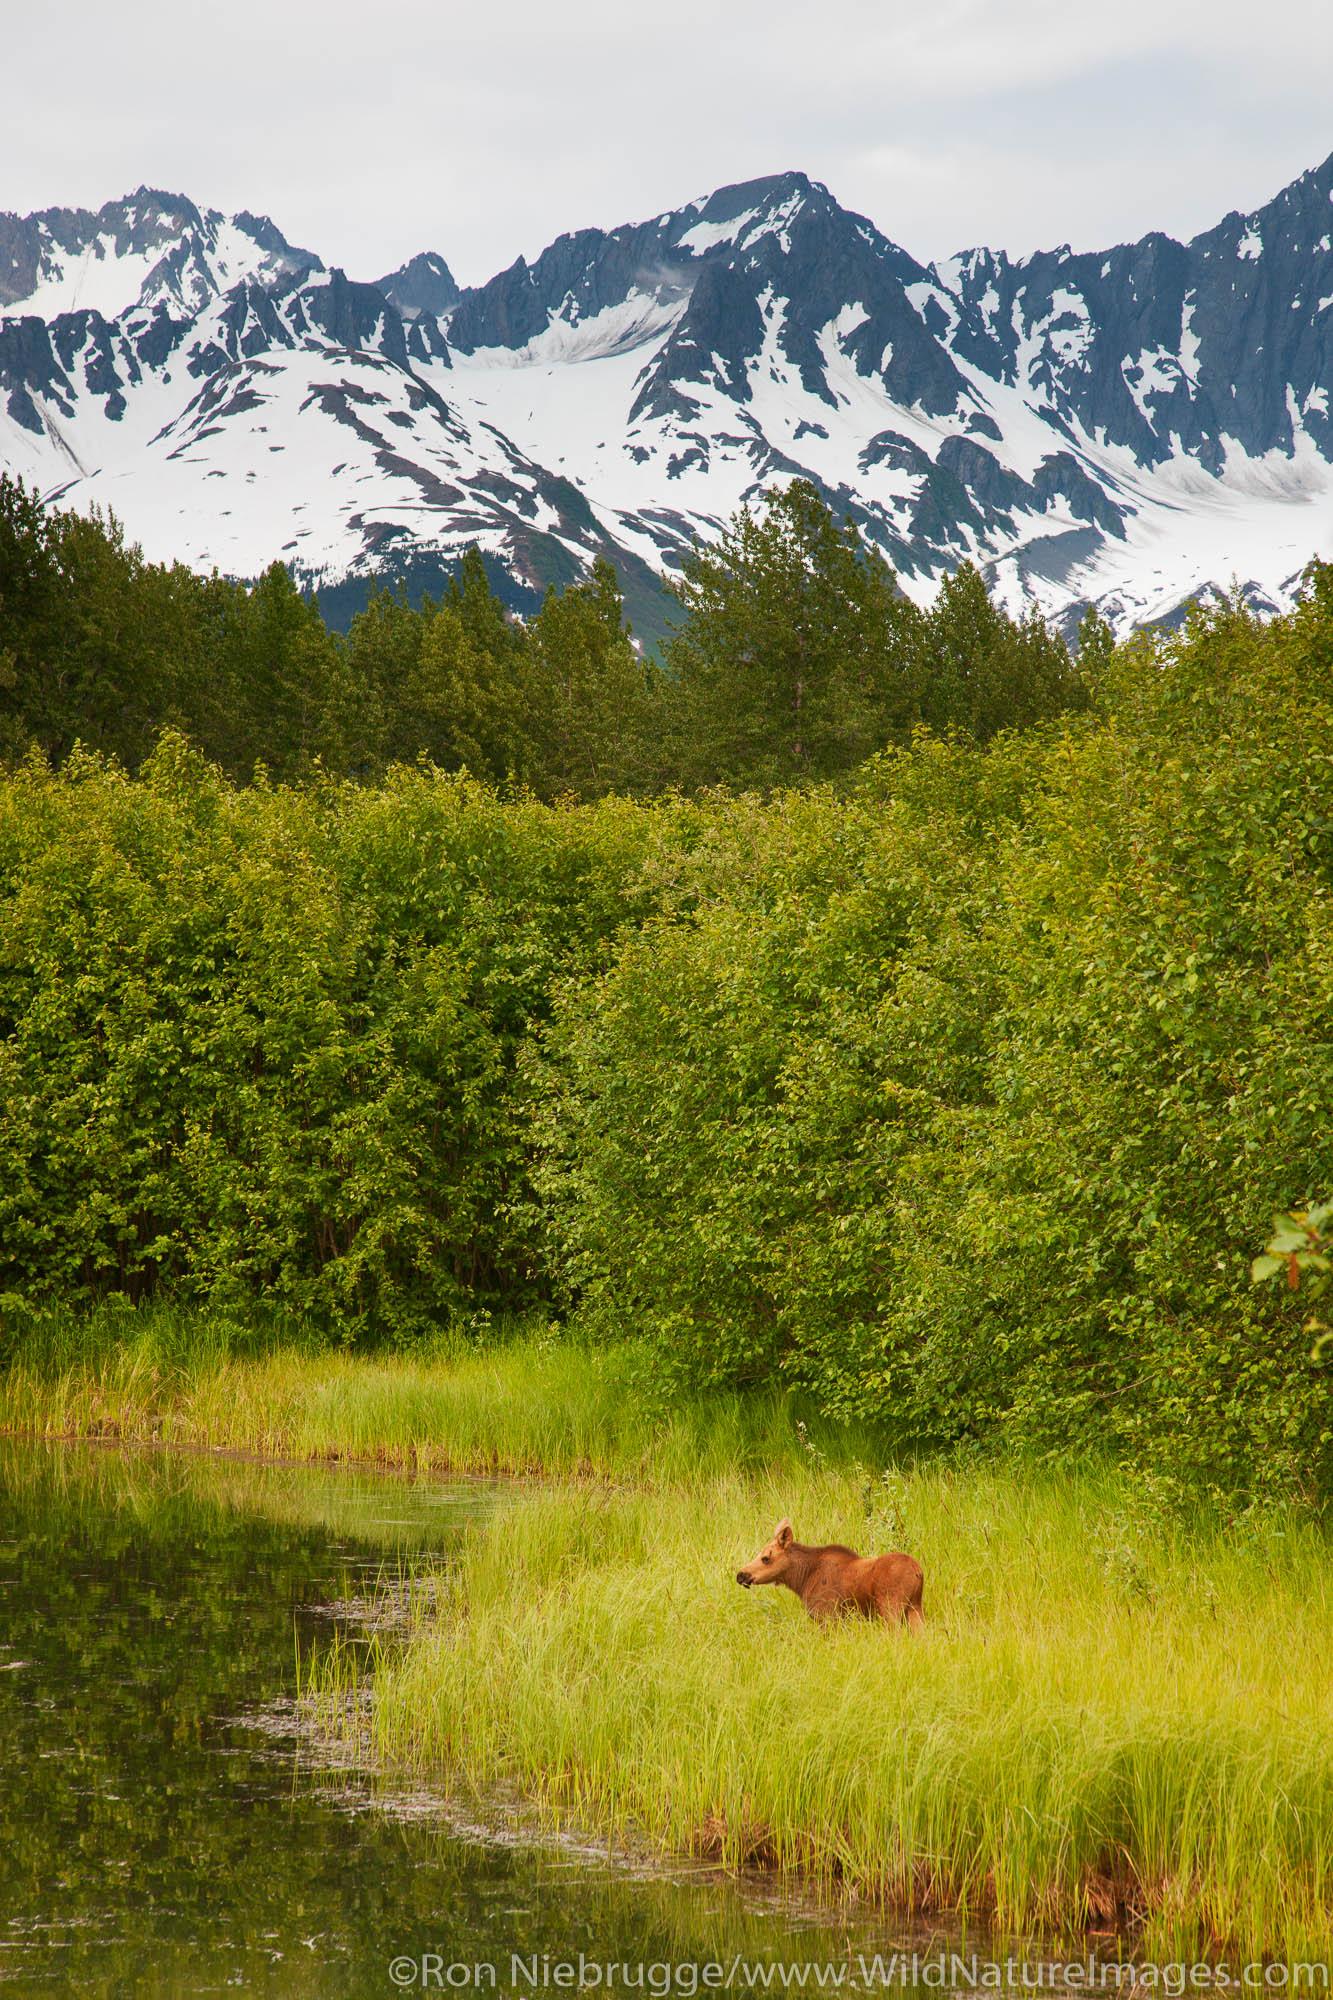 Young moose calf, Chugach National Forest, Seward,  Alaska.